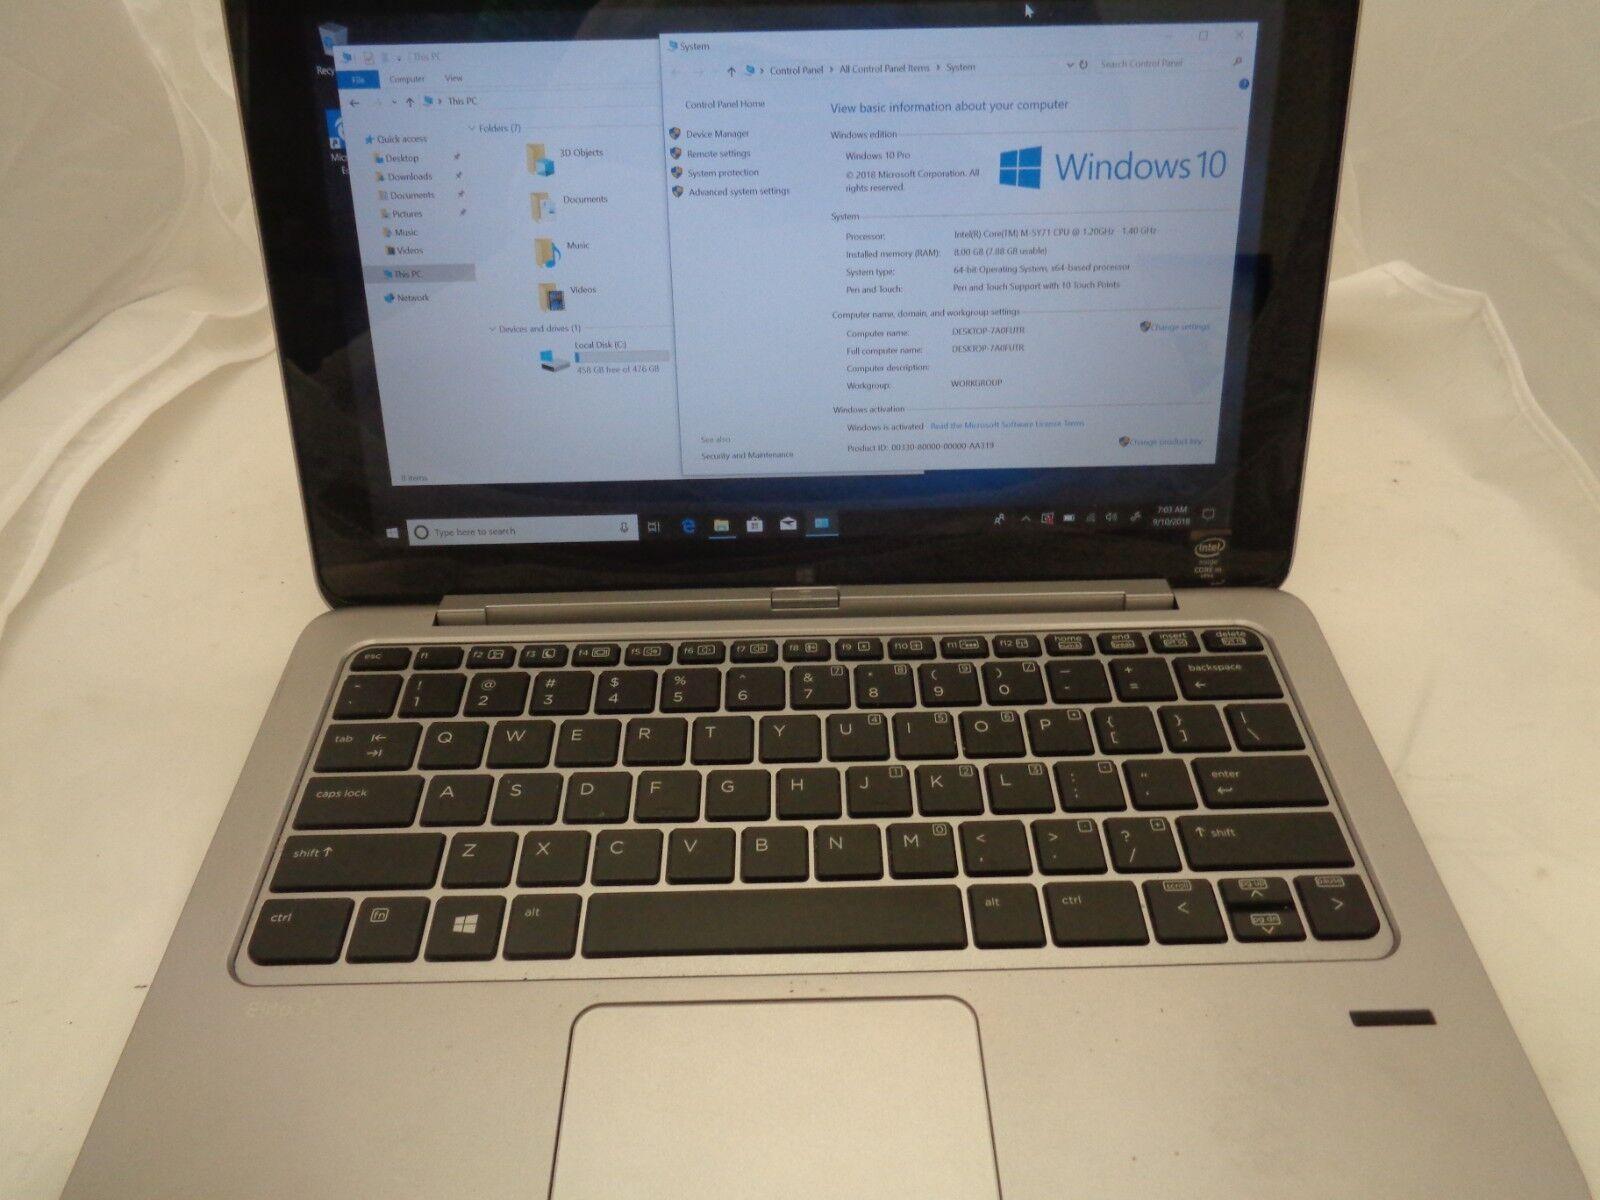 "HP Elite x2 1011 G1 11.6"" Intel Core M-5Y71 1.20GHz 8GB RAM 512GB SSD *Bios"